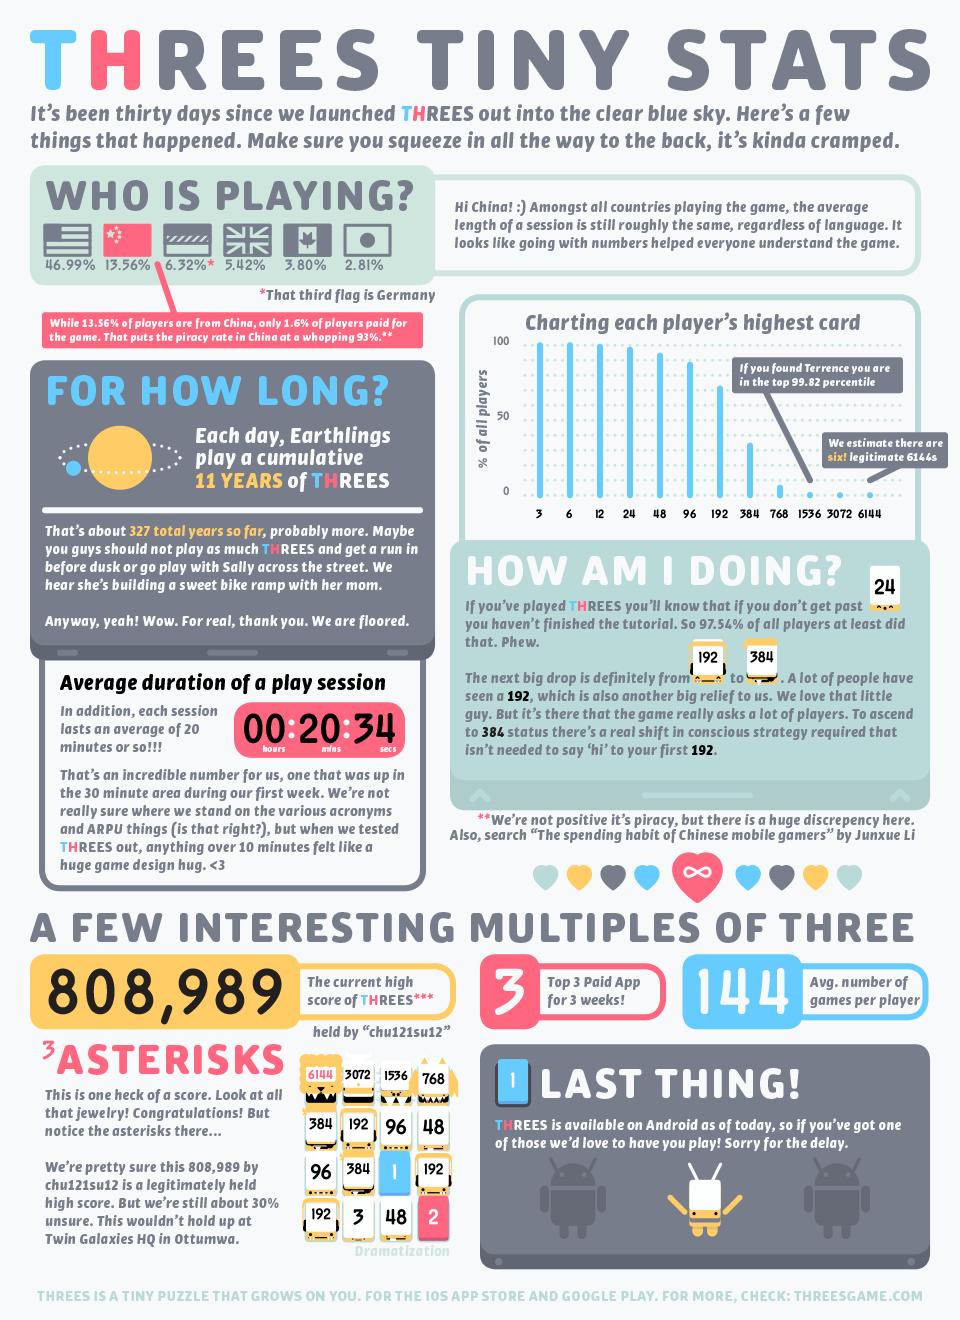 threes-infographic_960